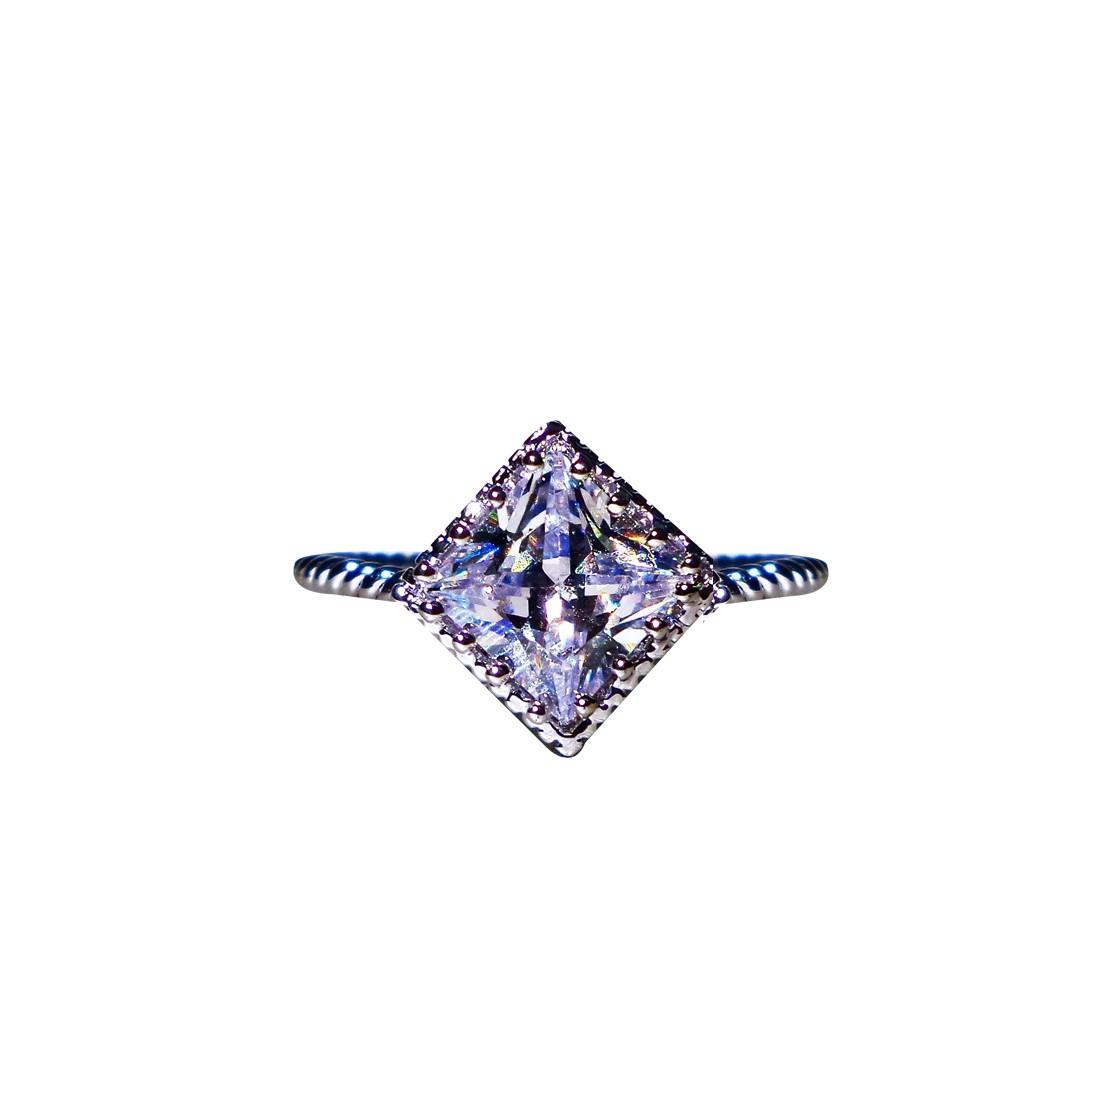 Allegra Ring - CS15419